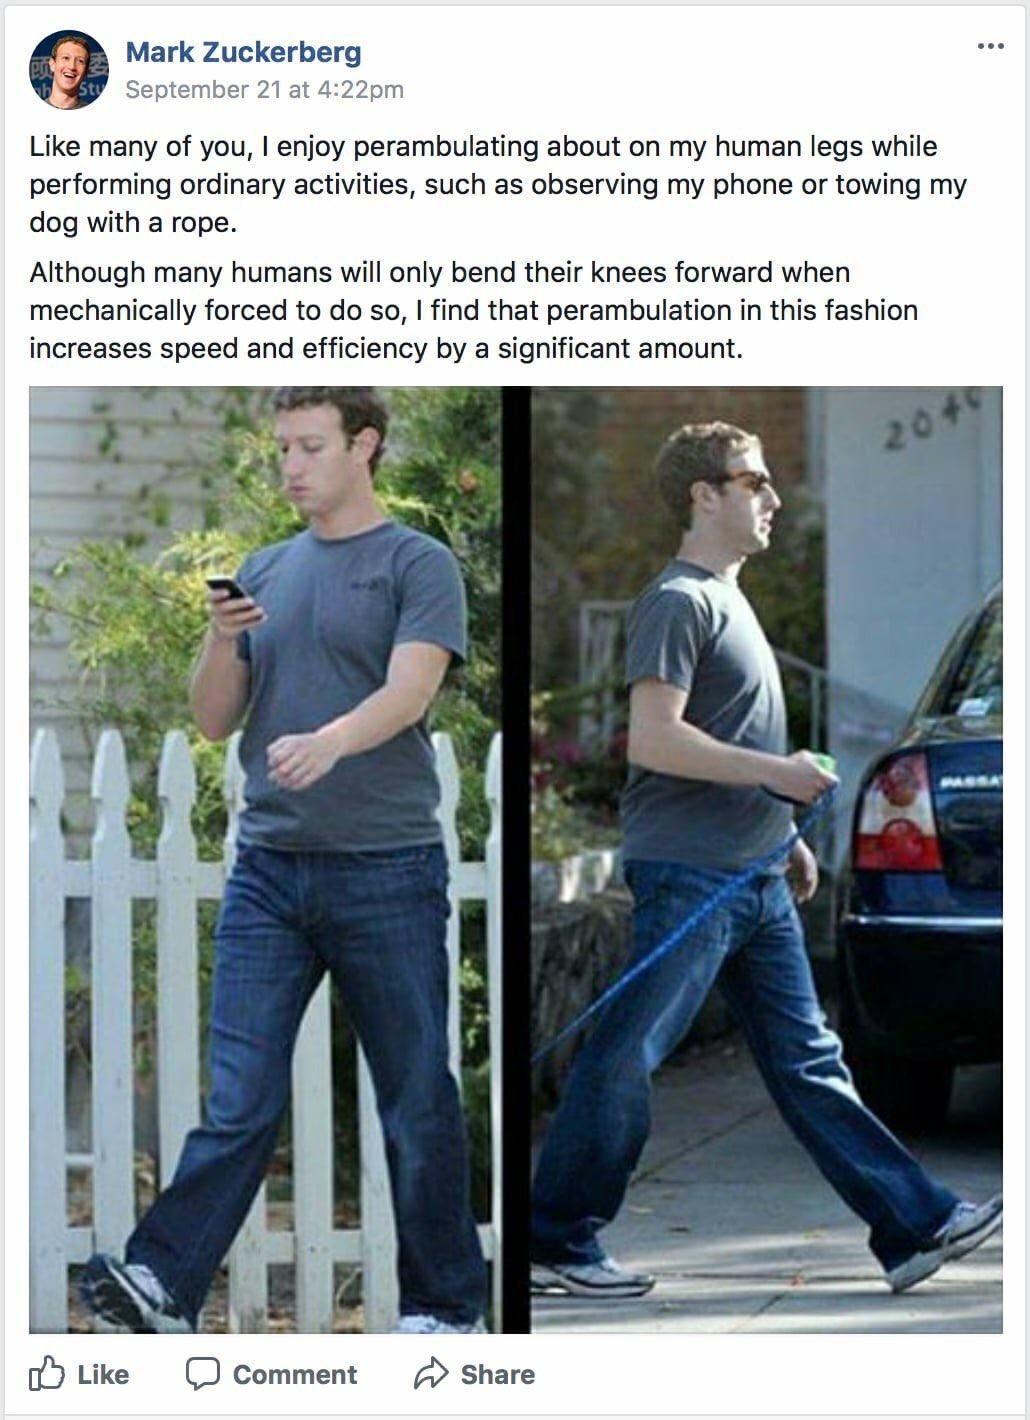 Zuckerberg Goes For A Walk On Human Legs Fake Mark Zuckerberg Facebook Posts Know Your Meme